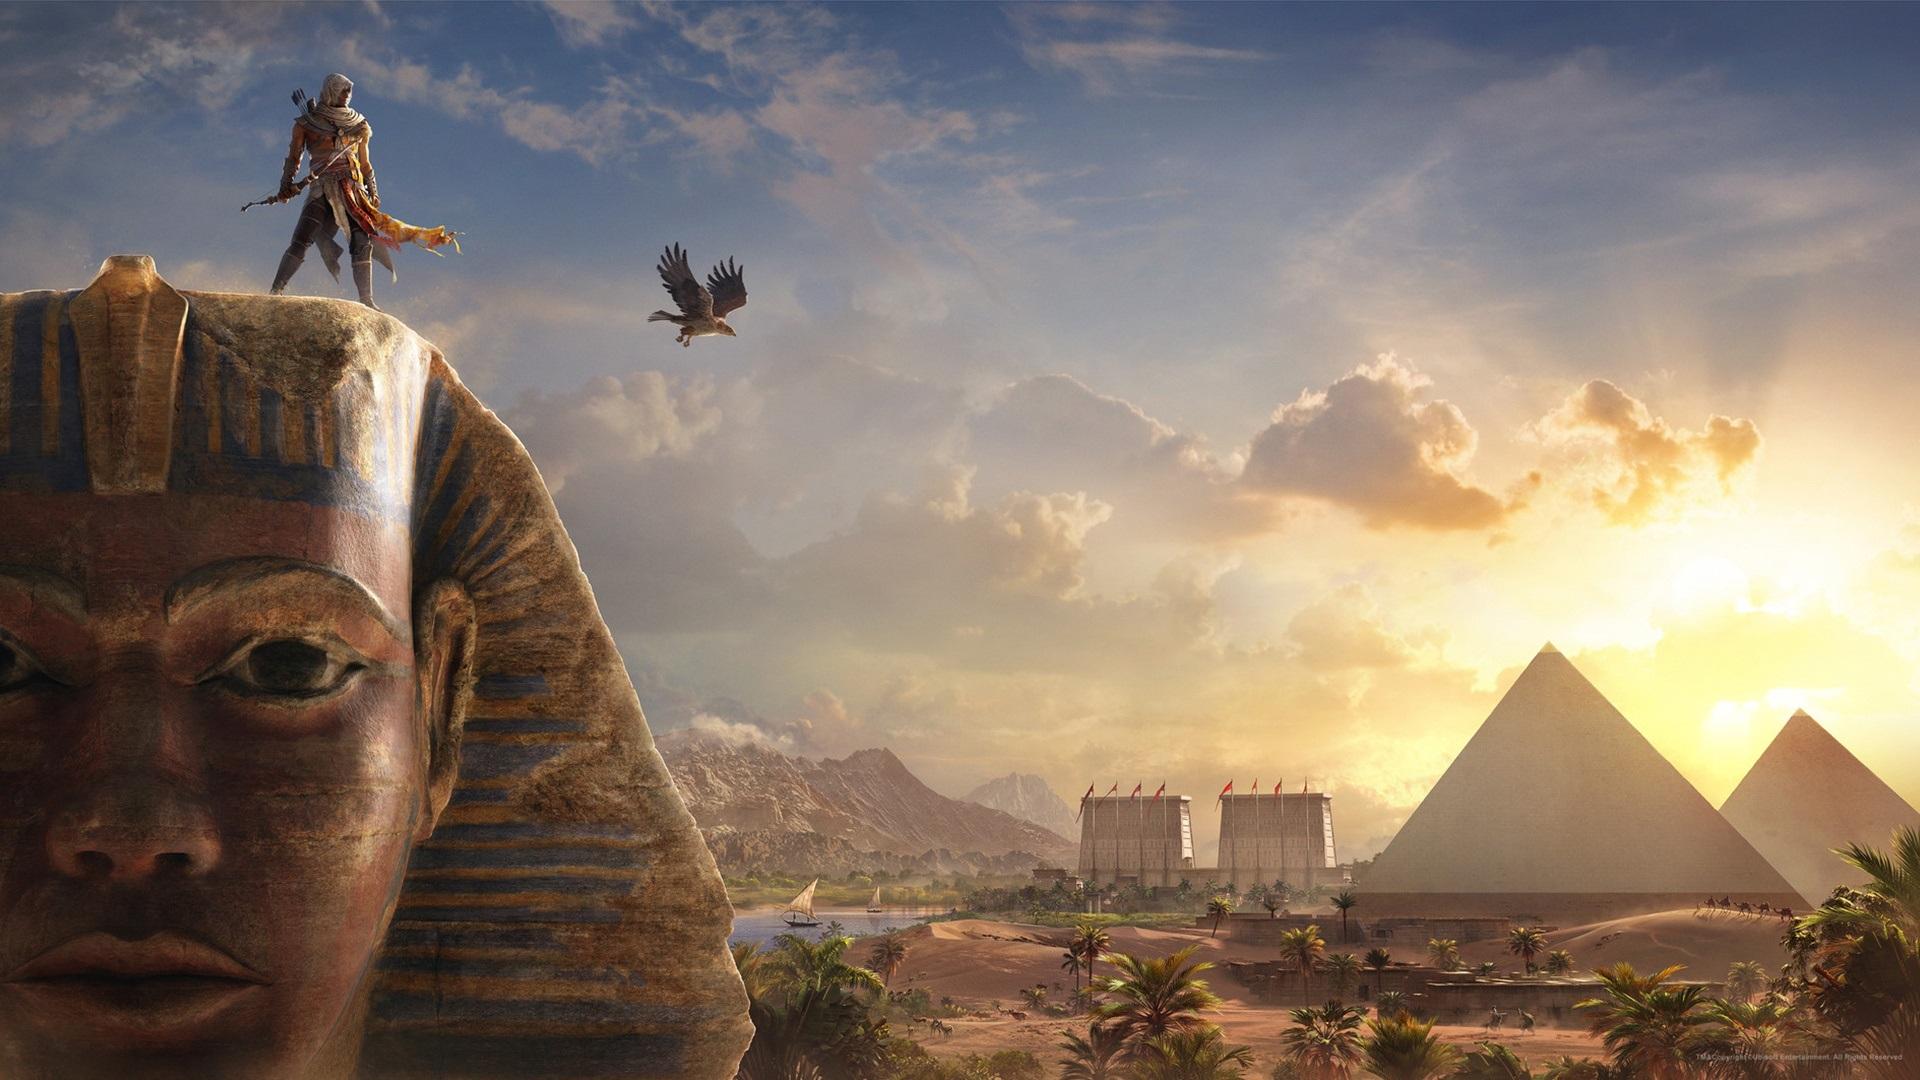 Wallpaper Assassin S Creed Origins Sphinx Egypt 1920x1080 Full